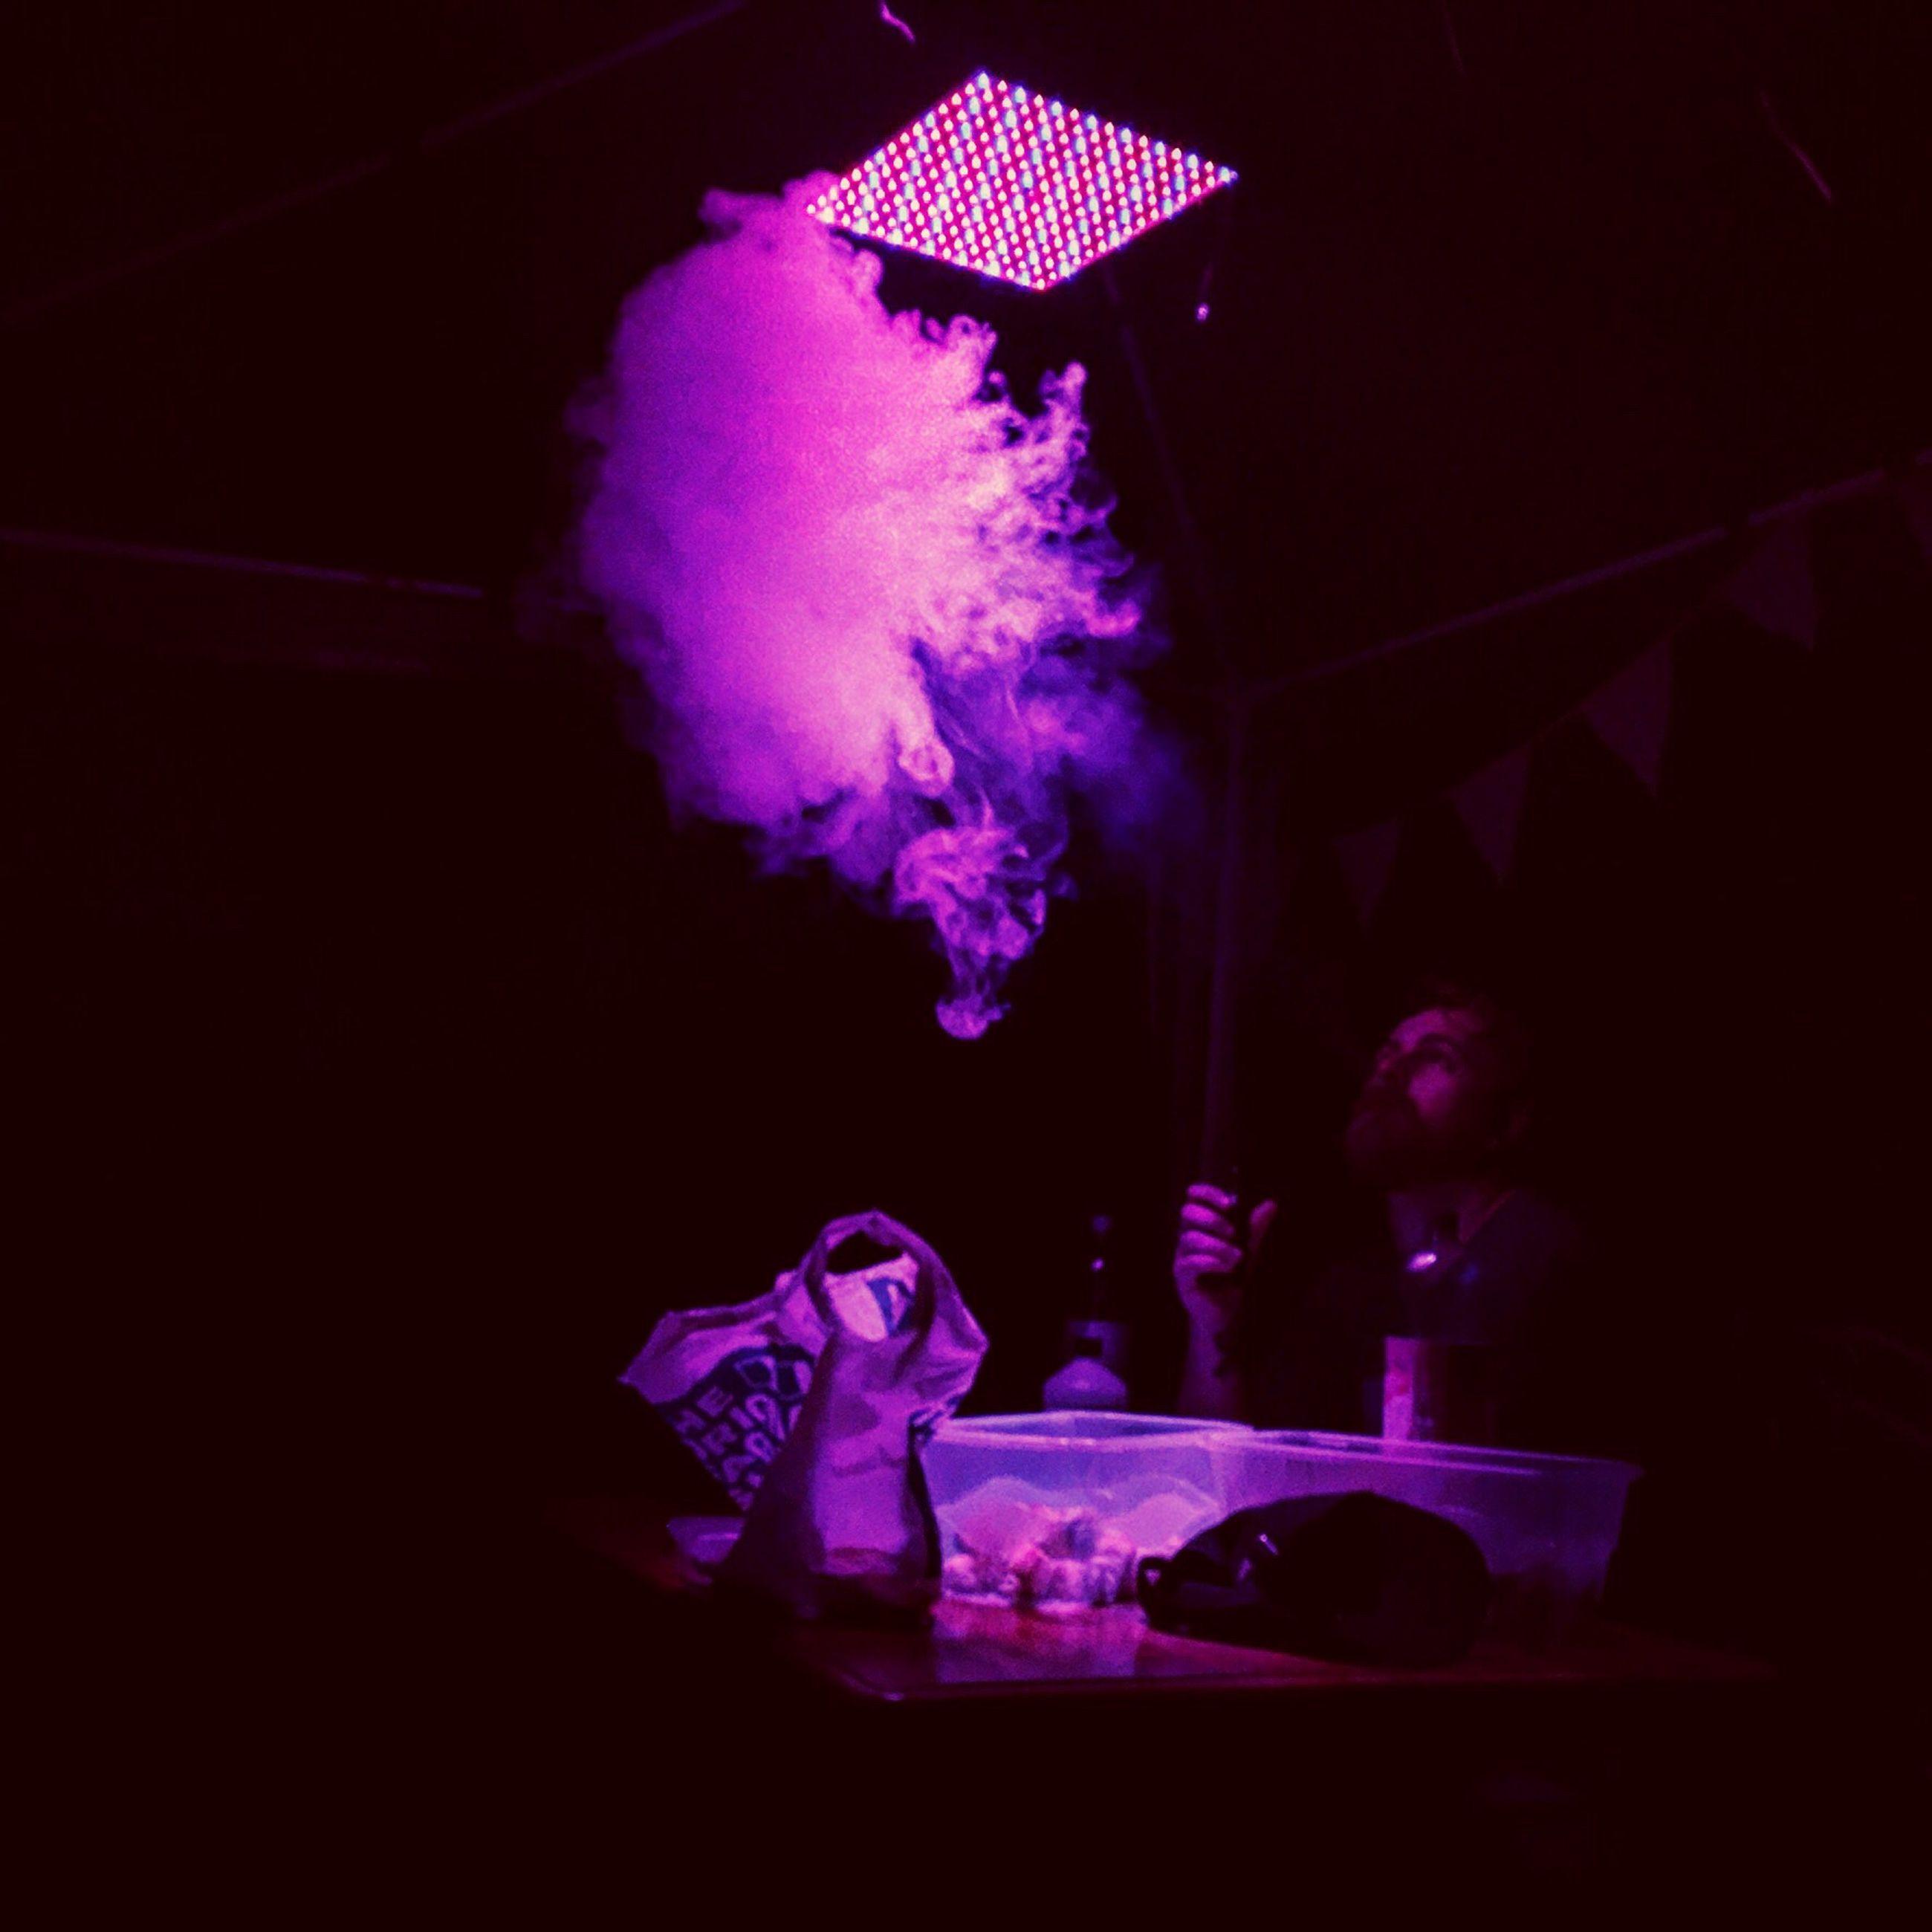 indoors, close-up, pink color, night, dark, electric light, darkroom, freshness